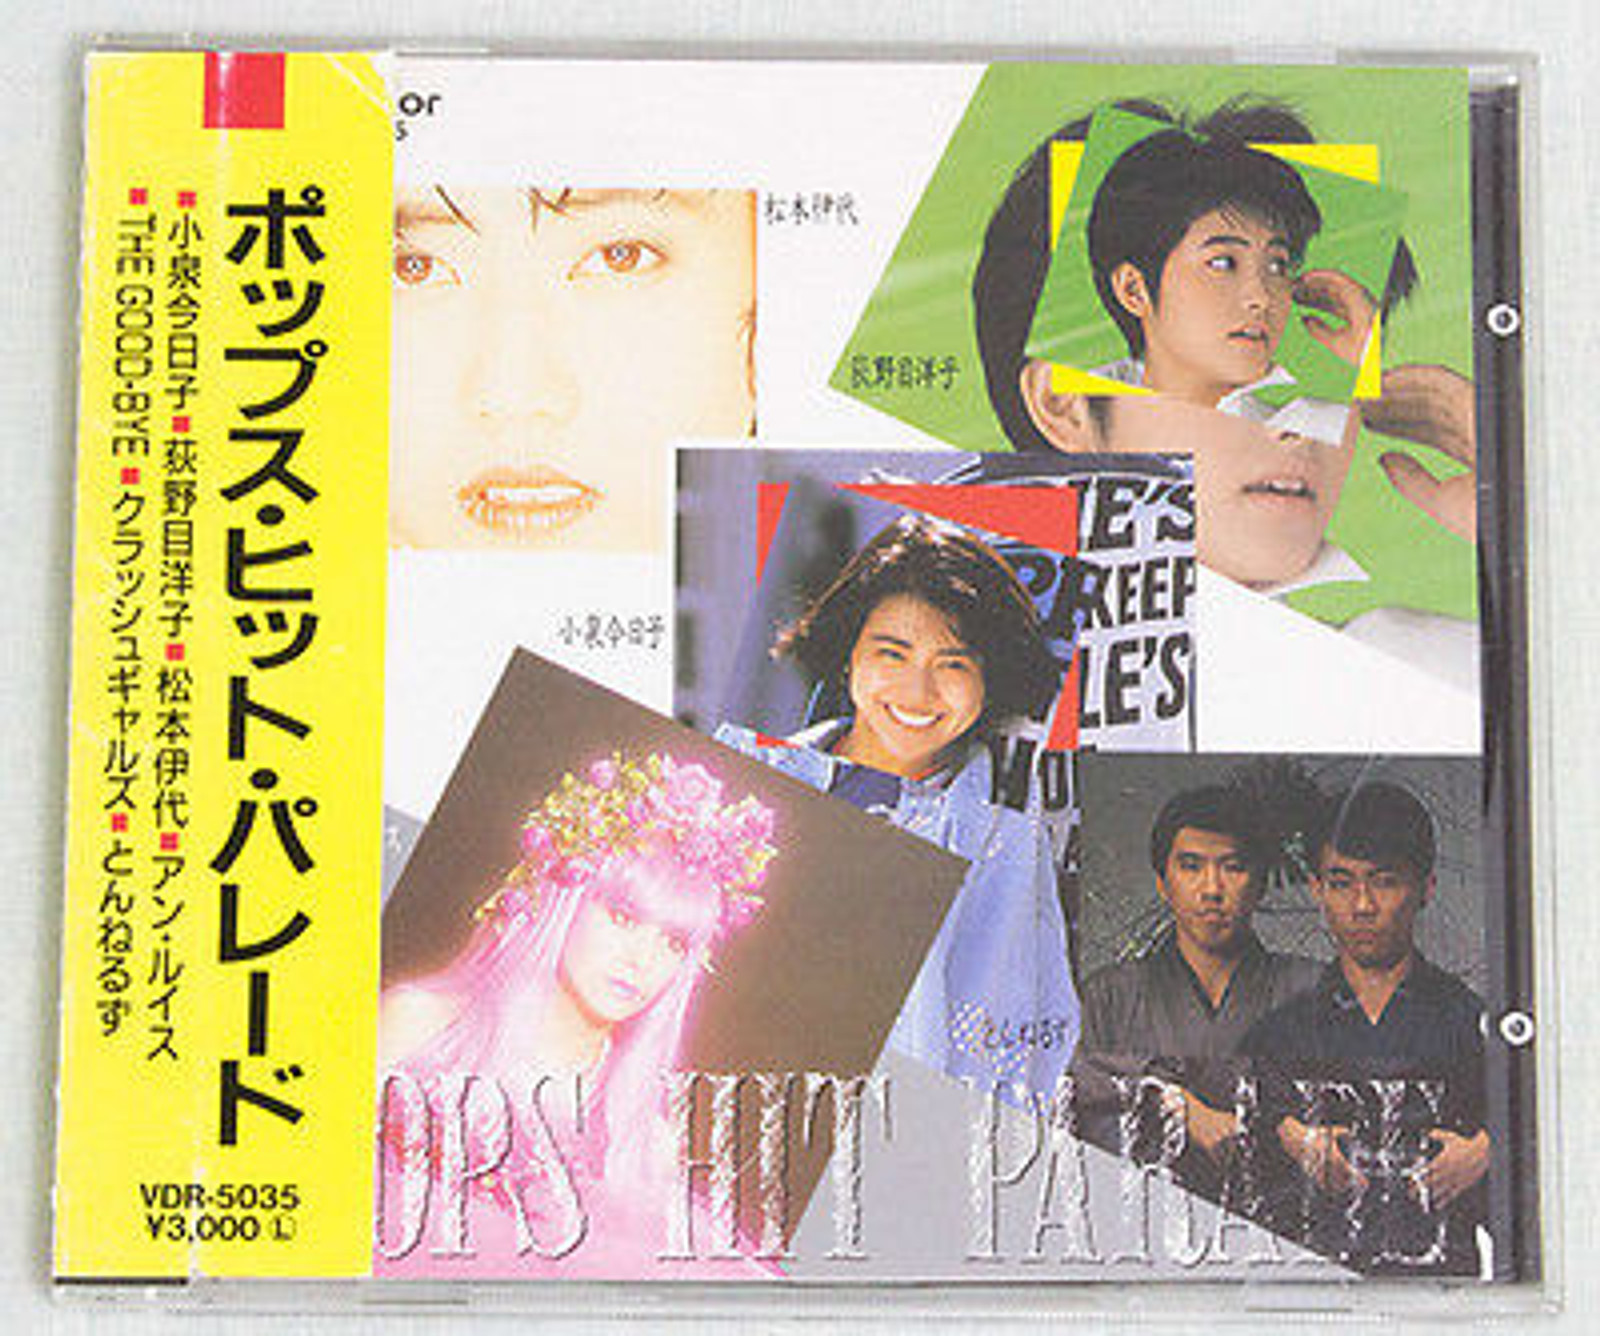 JAPAN 80's Pops Hit Parade CD KYOKO KOIZUMI BEAT(KITANO) TAKESHI &more